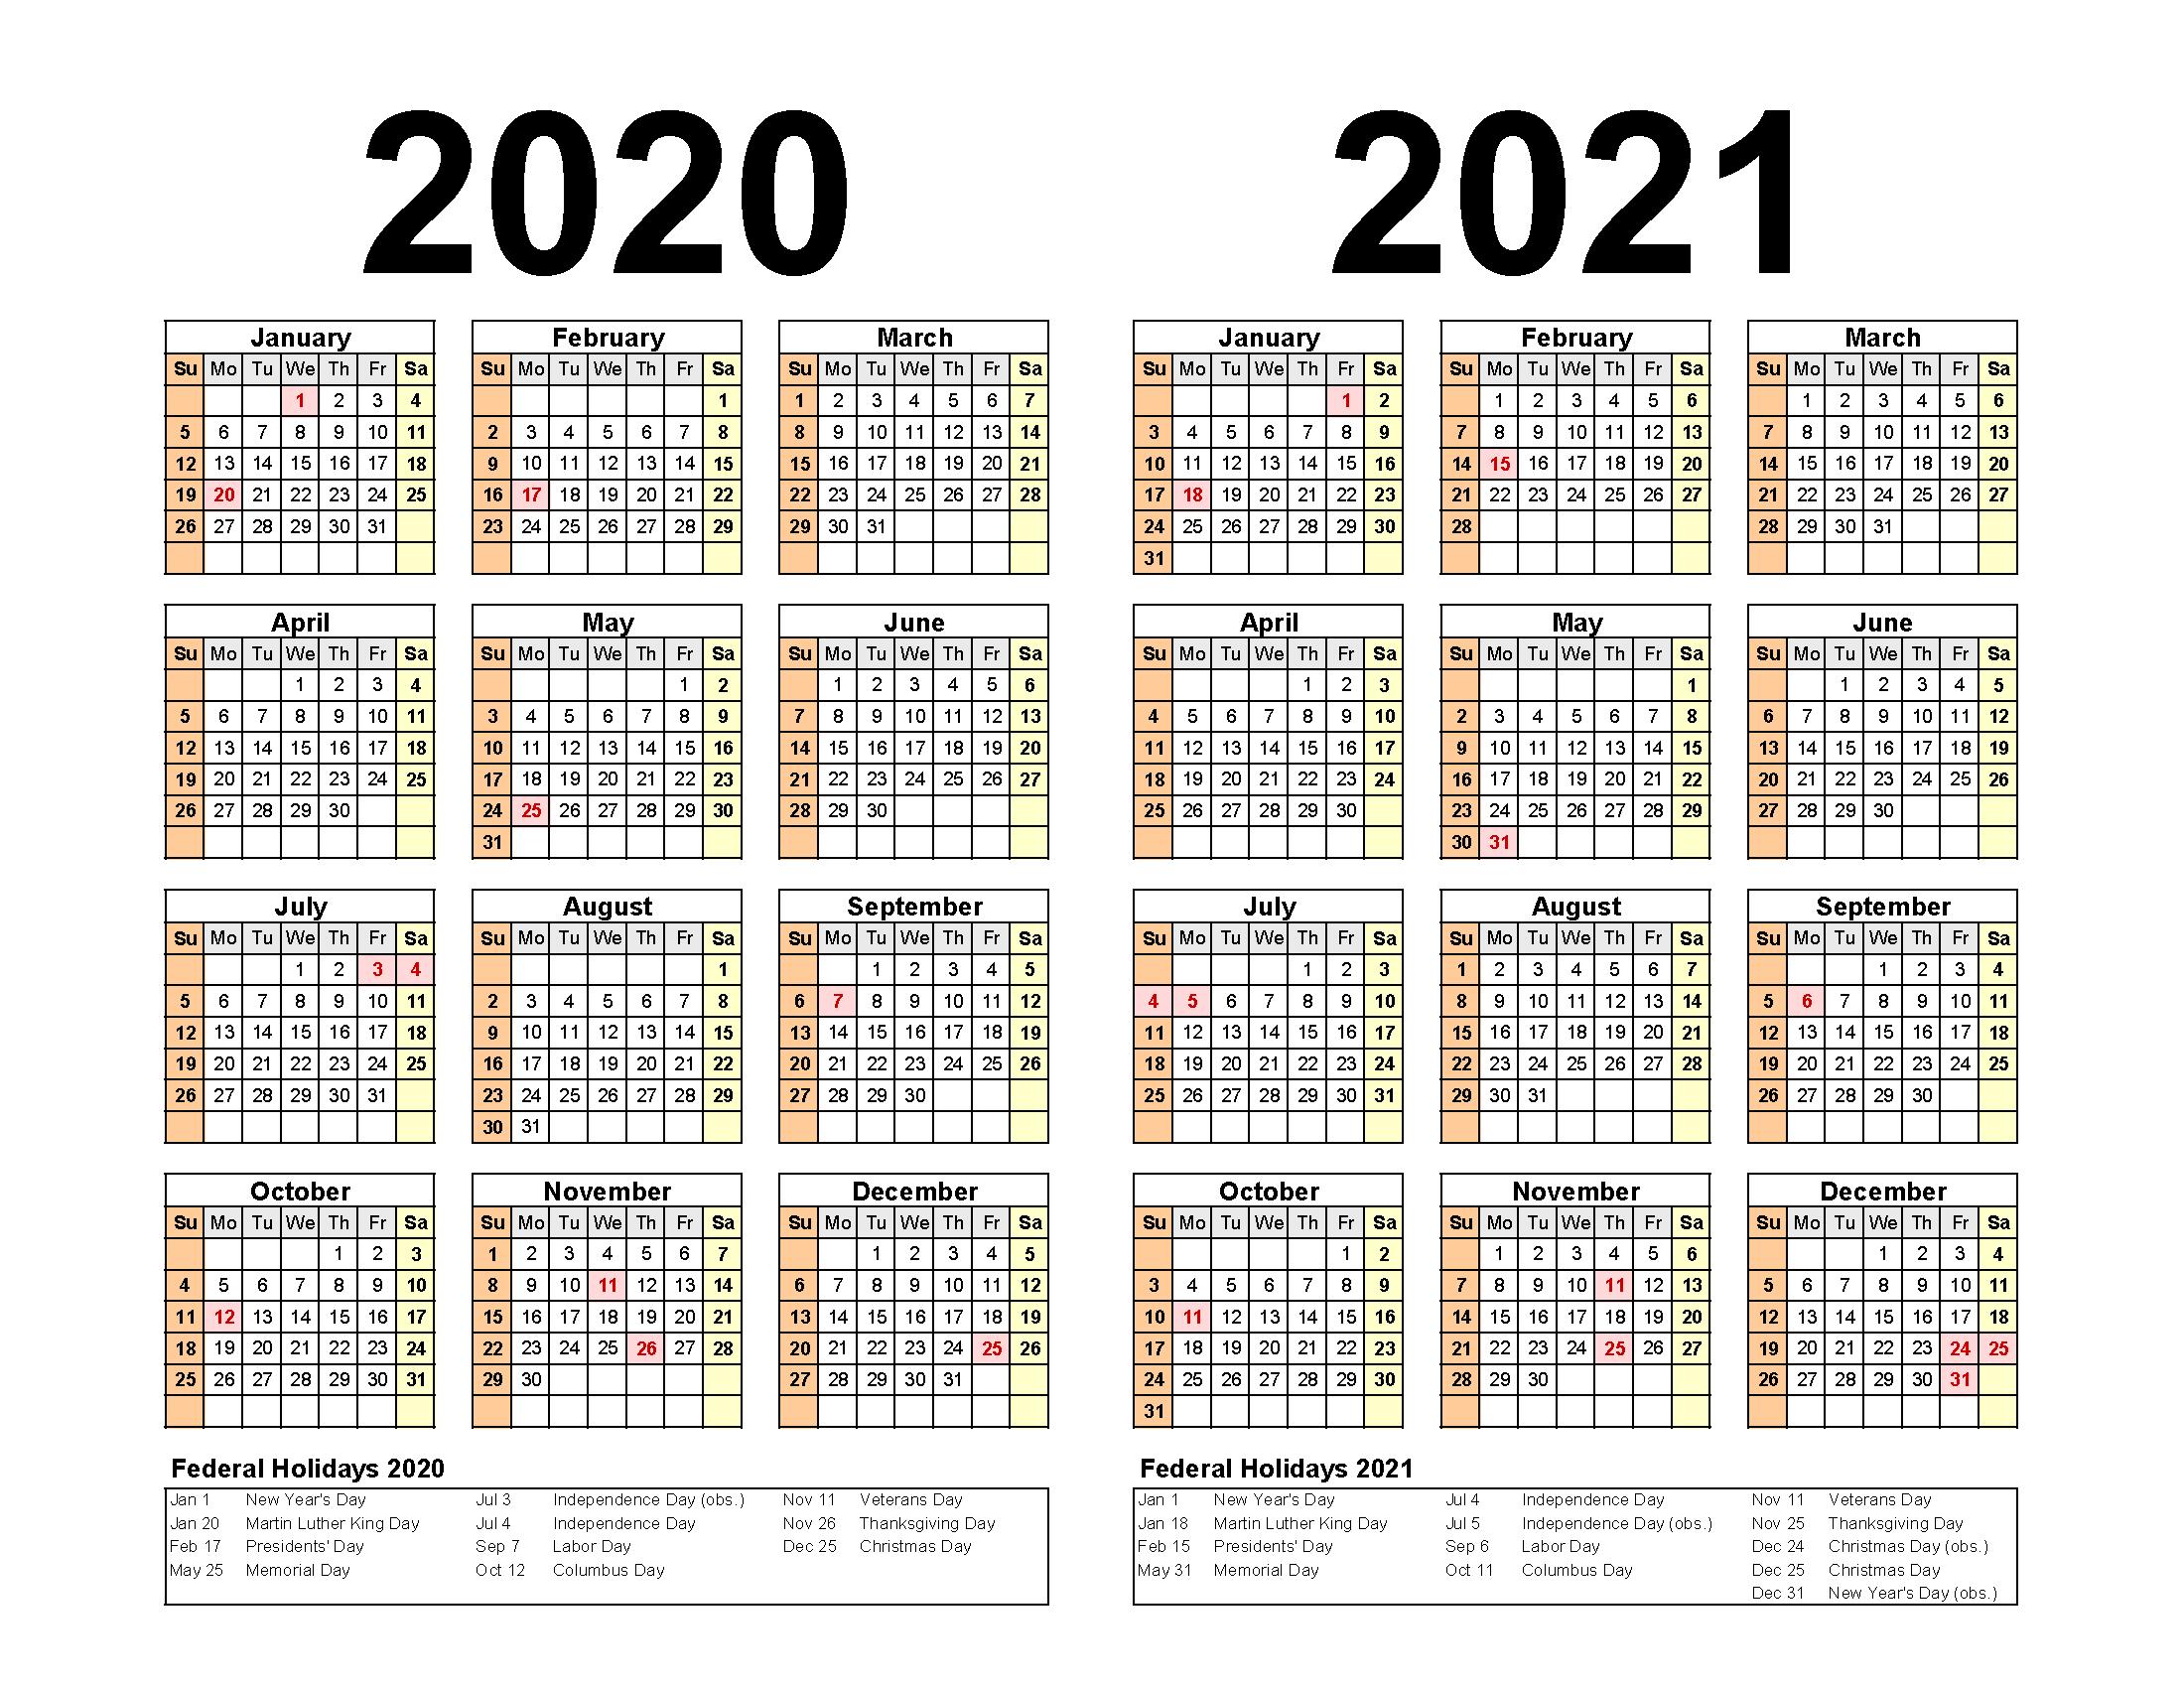 Free Printable 2020 2021 Calendar with Holidays PDF, Word ...